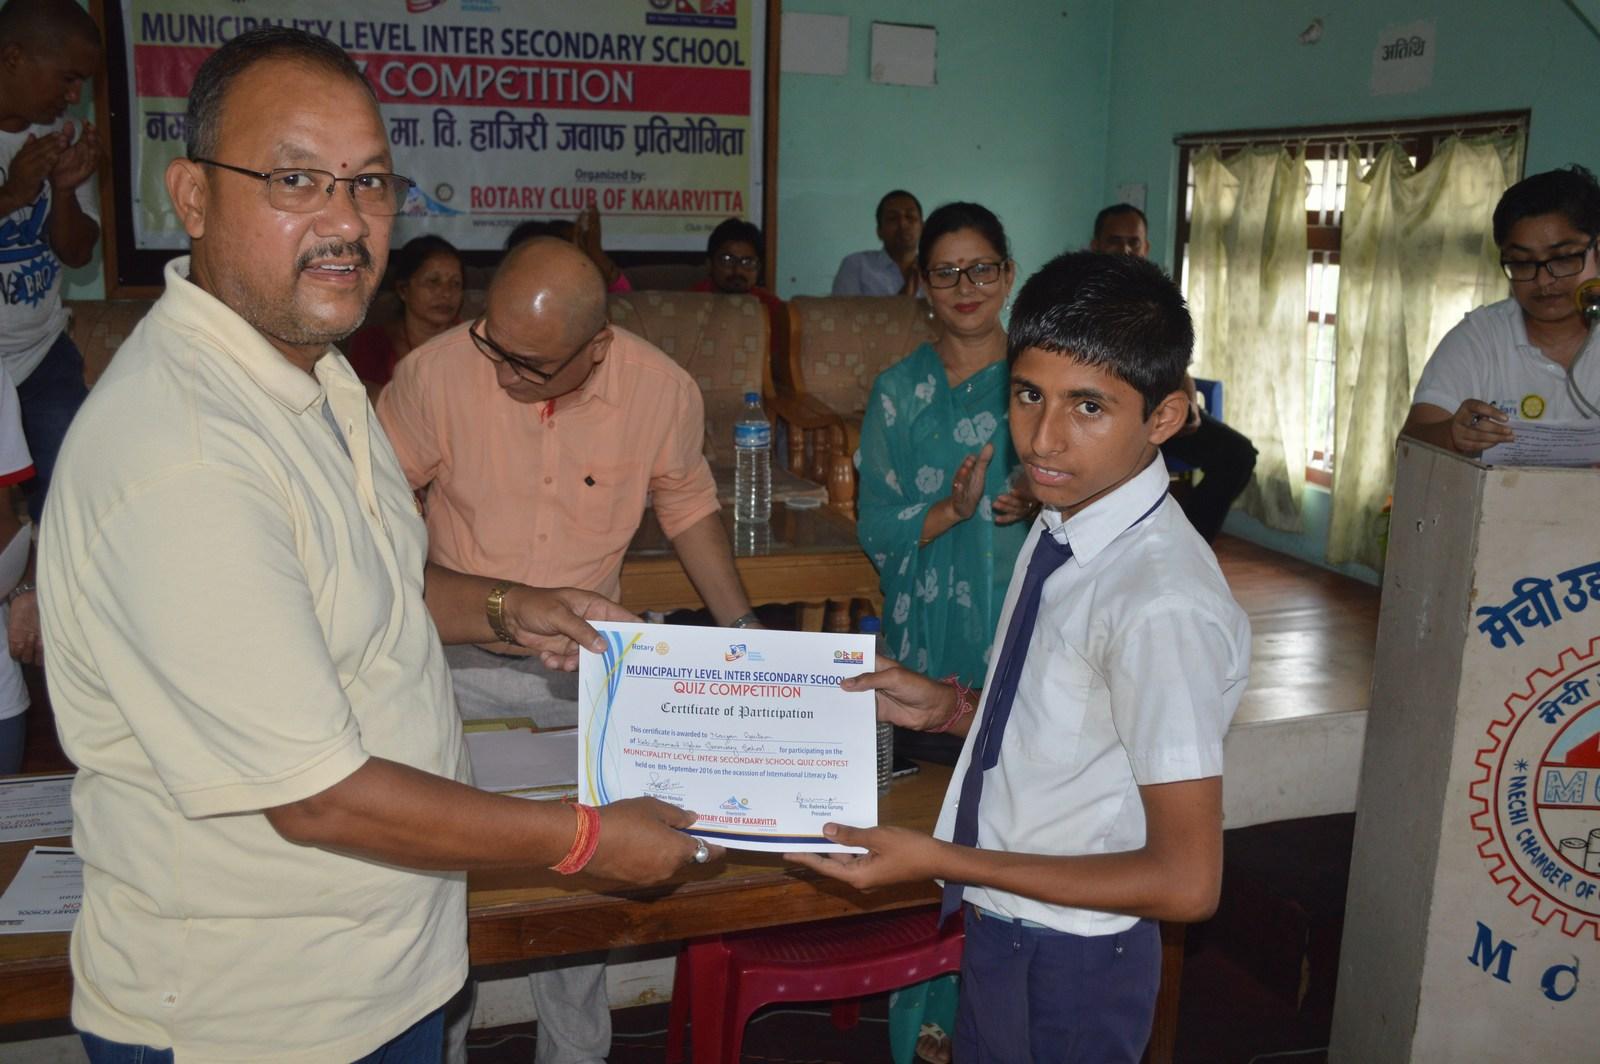 Municipality-Level-Inter-Secondary-School-Quiz-Contest-2016-Rotary-Club-of-Kakarvitta-51